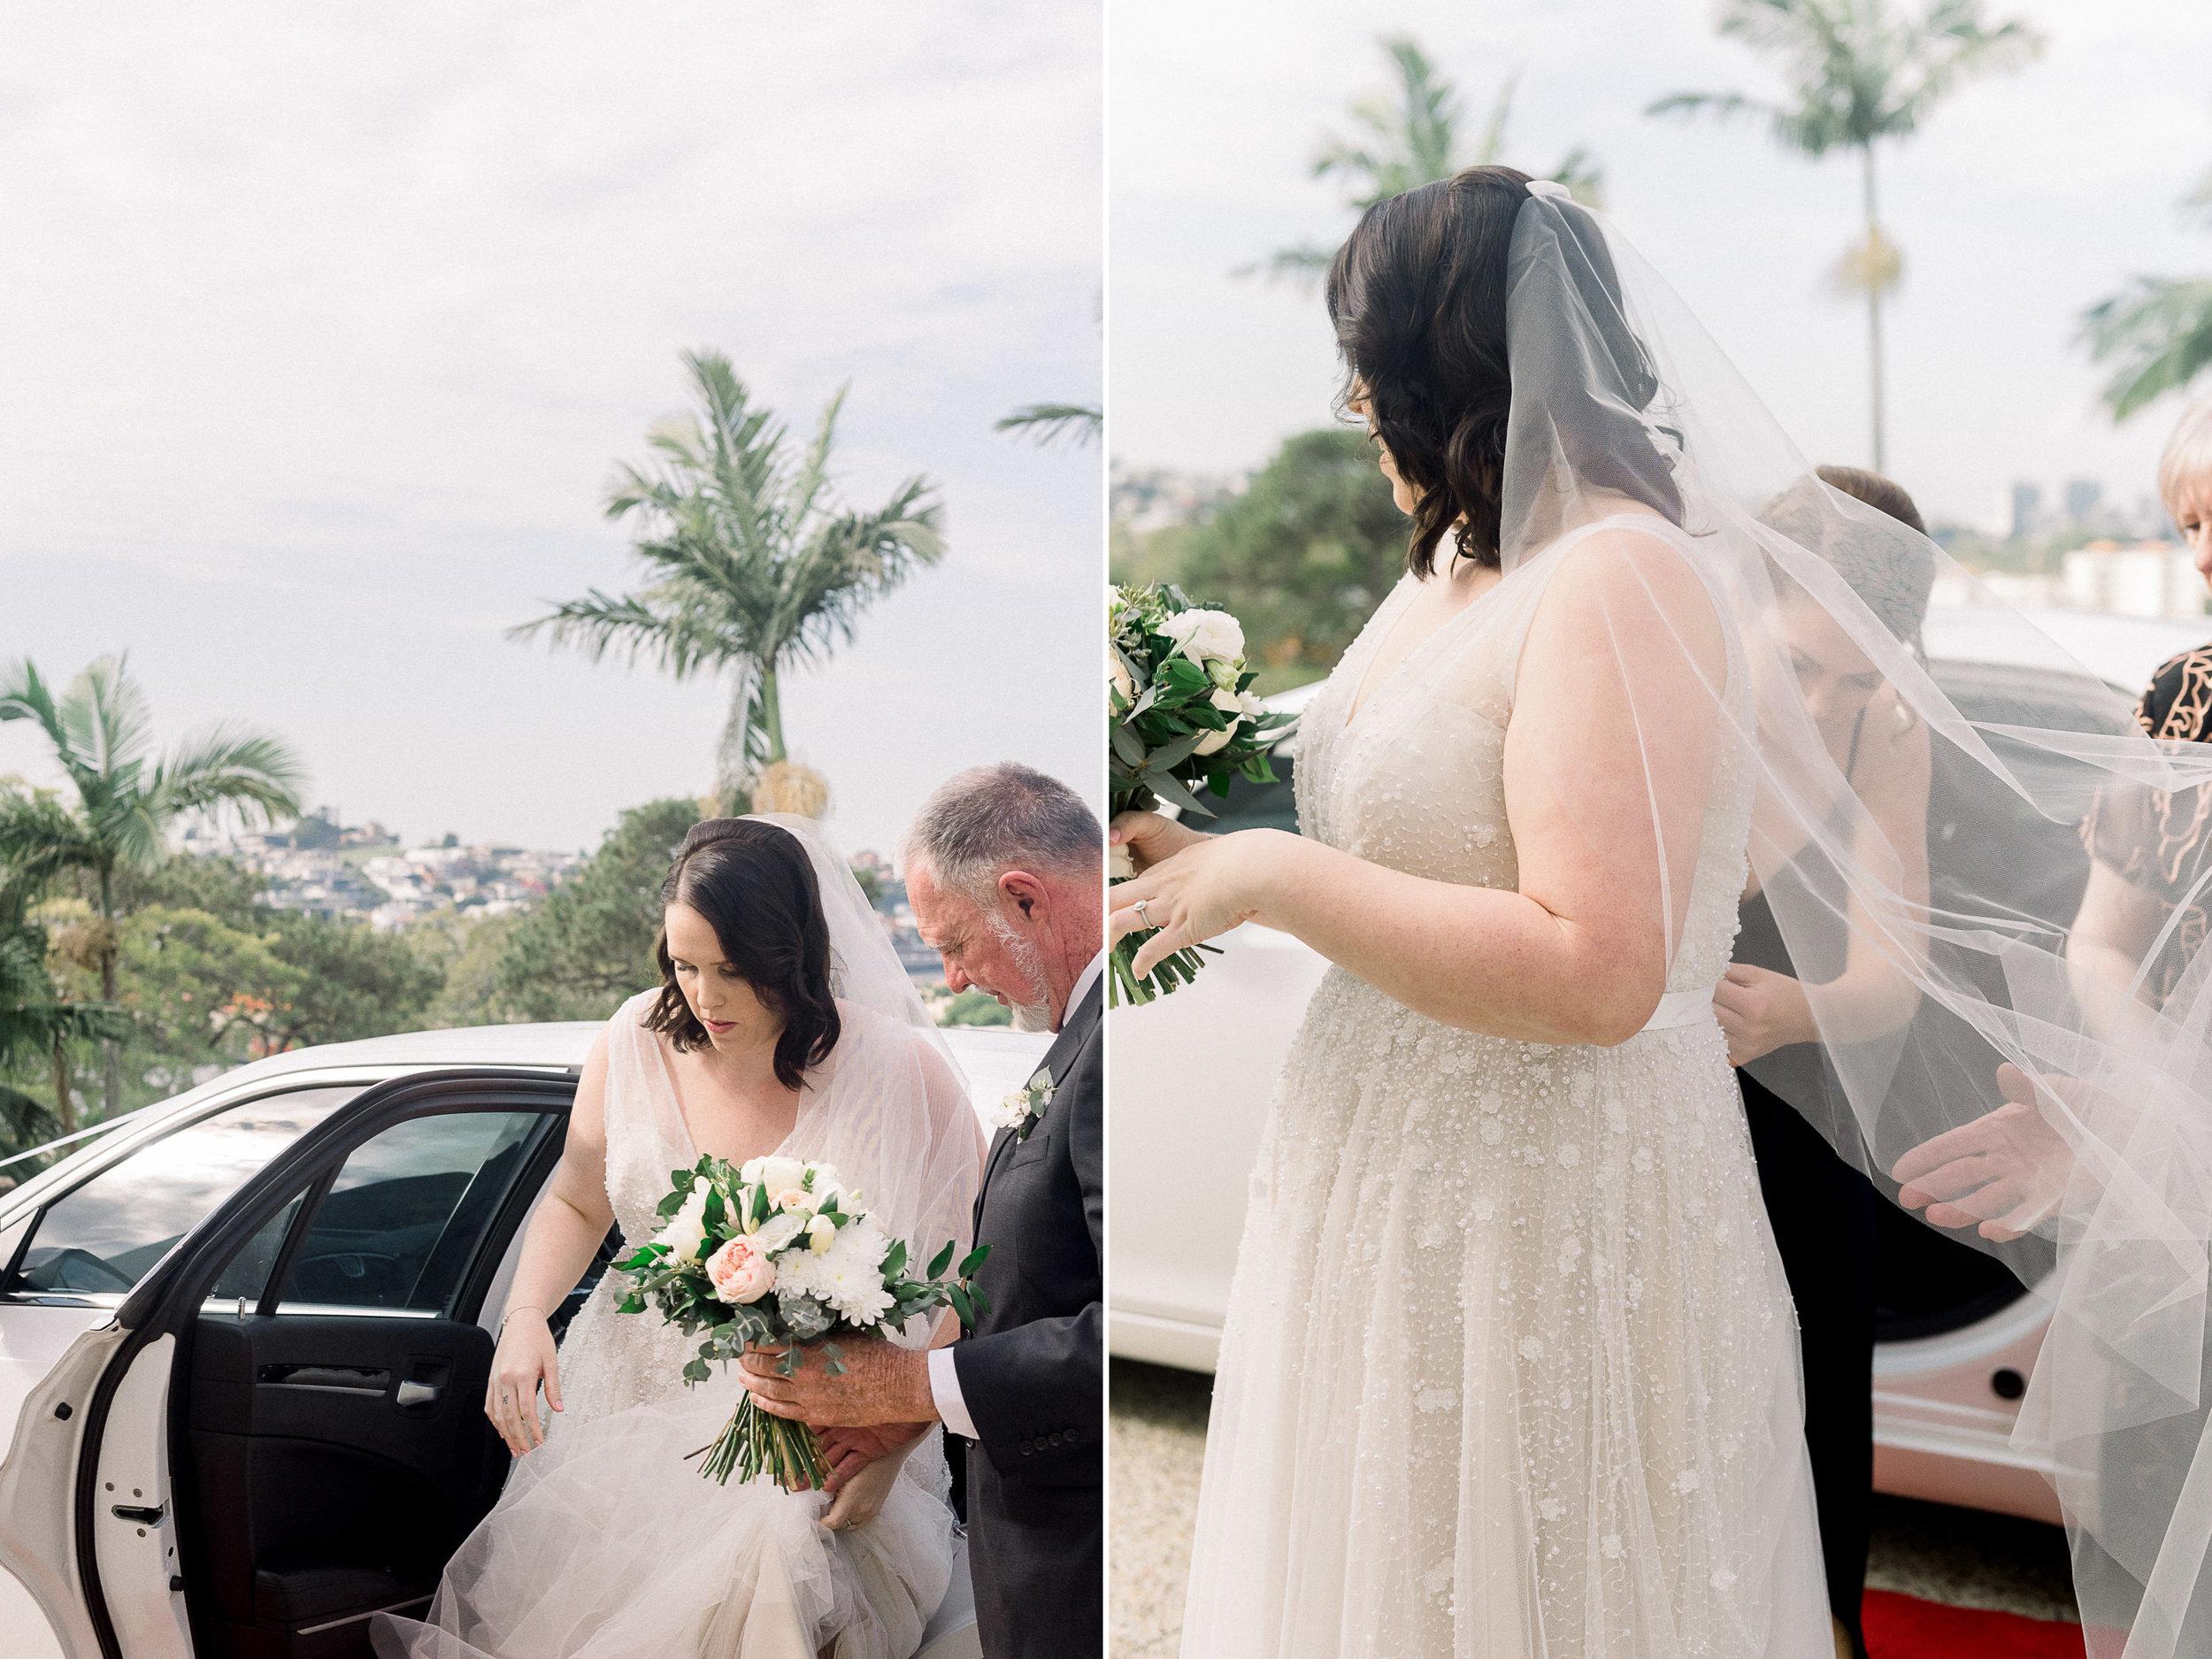 brisbane-city-wedding-church-ceremony-wedding-1.jpg